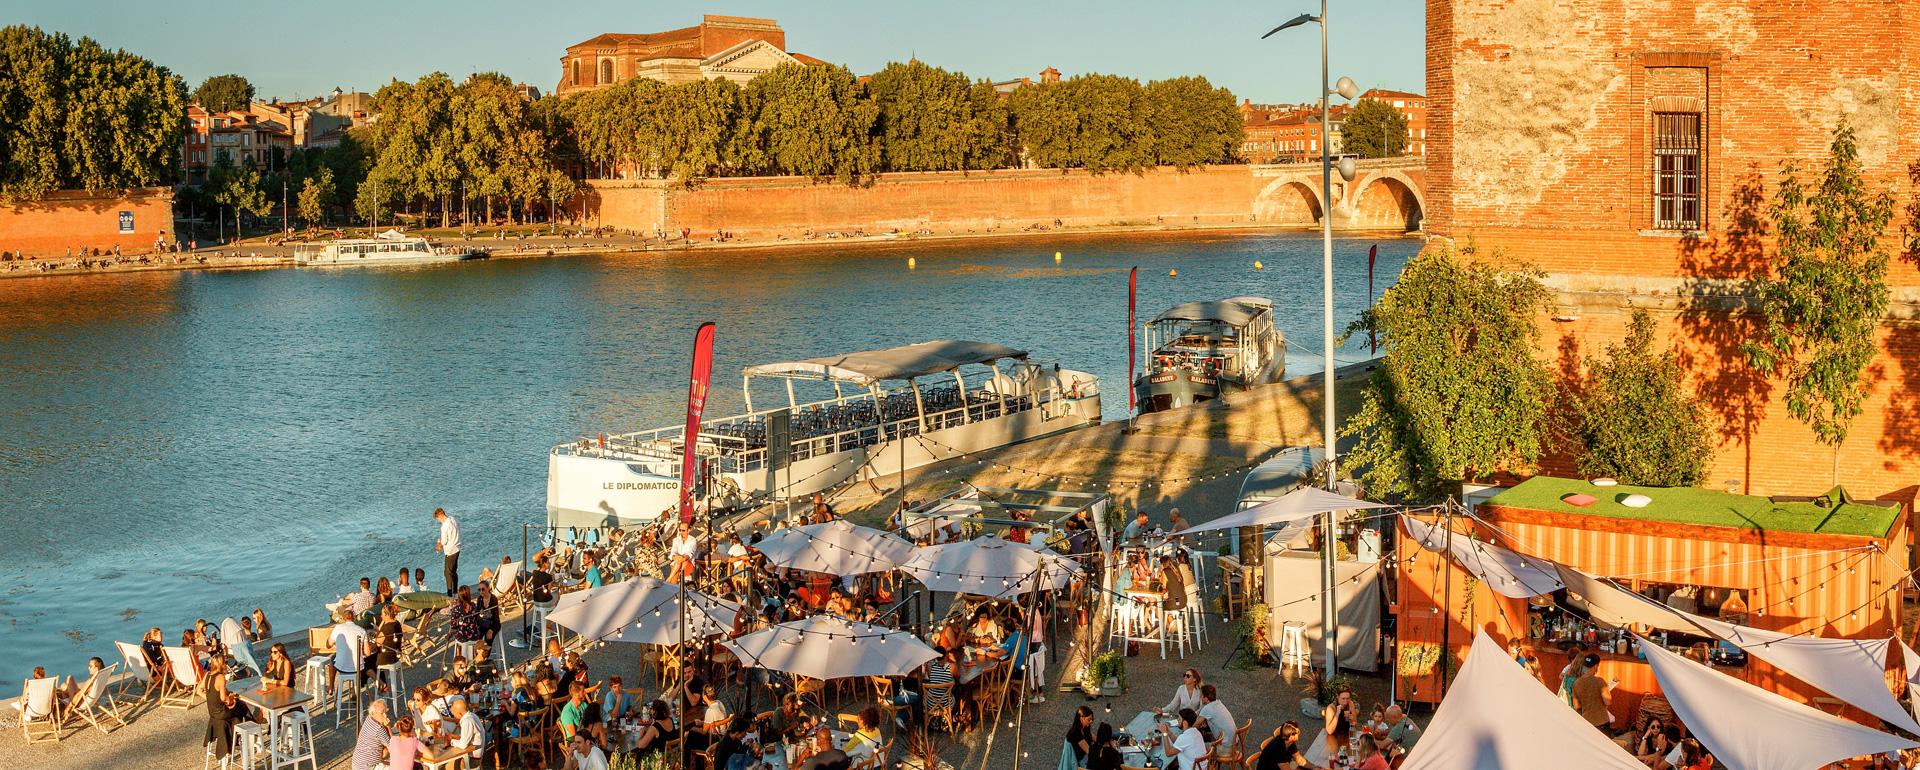 Toulouse - Haute-Garonne